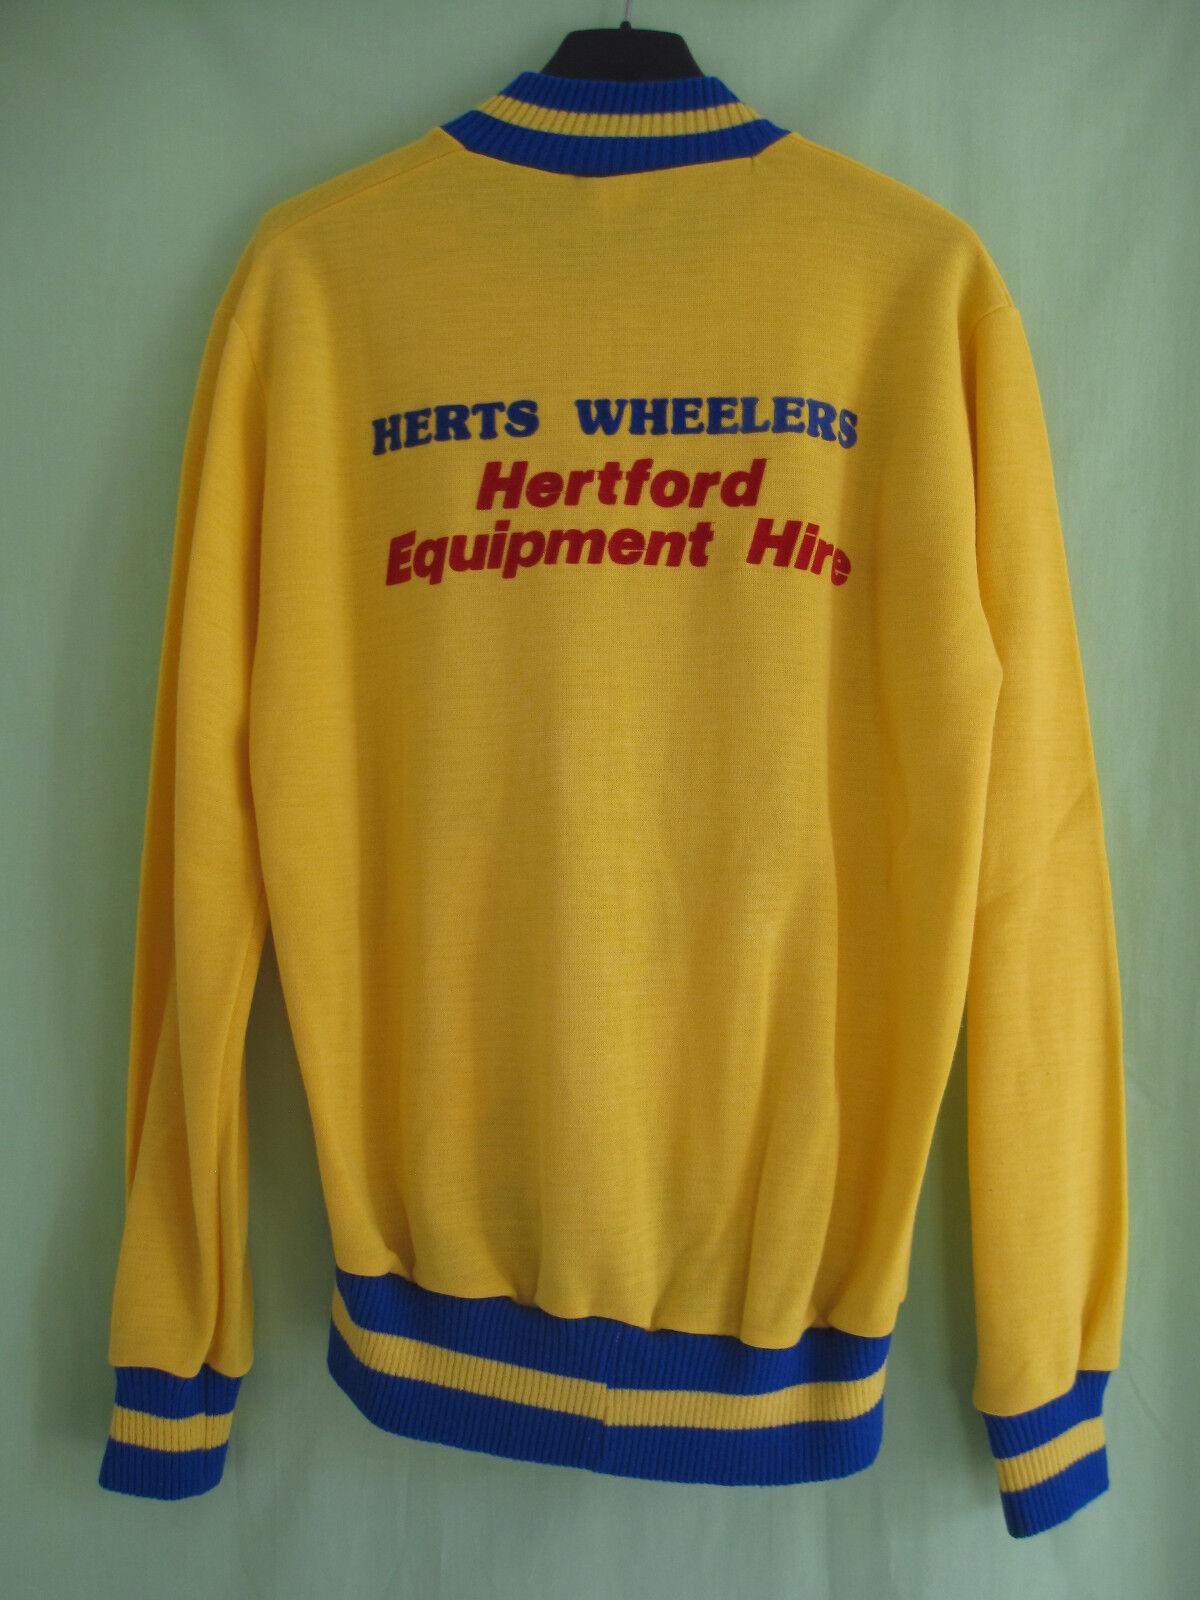 Veste cycliste Hertford vintage Herts wheelers Acrylique yellow Gibsport - S